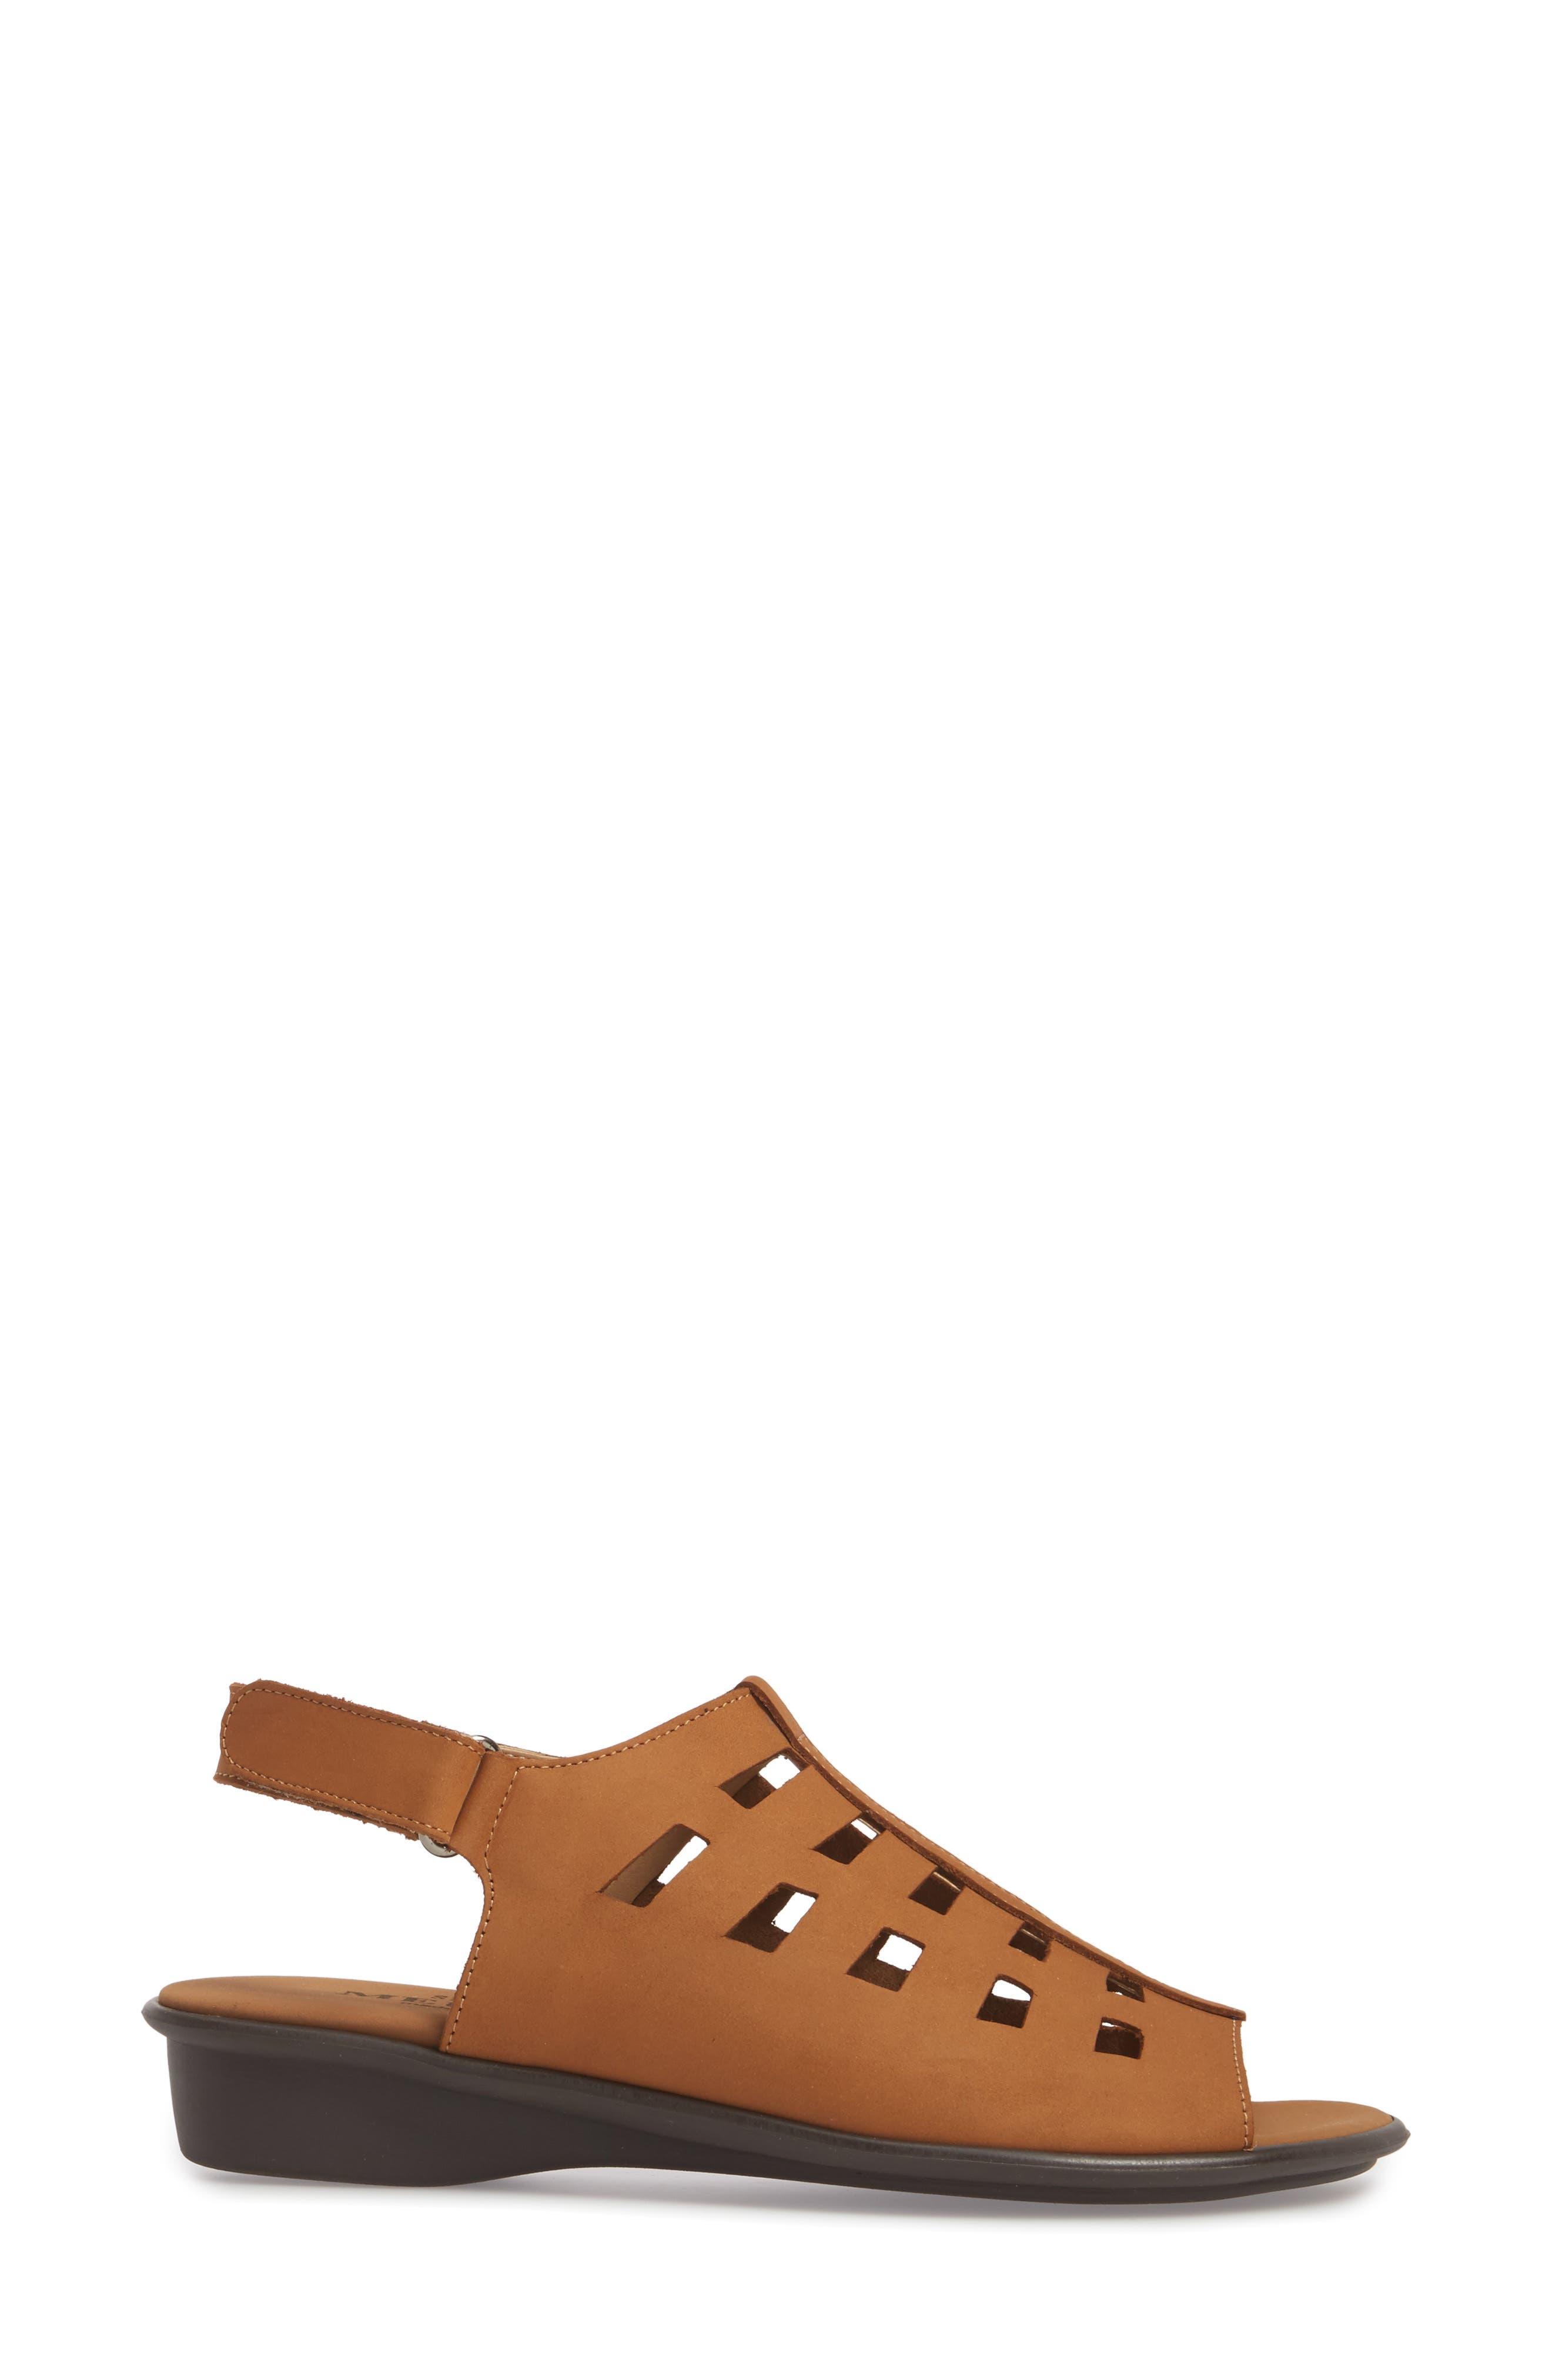 Elita Cutout Slingback Sandal,                             Alternate thumbnail 3, color,                             Viso Nubuck